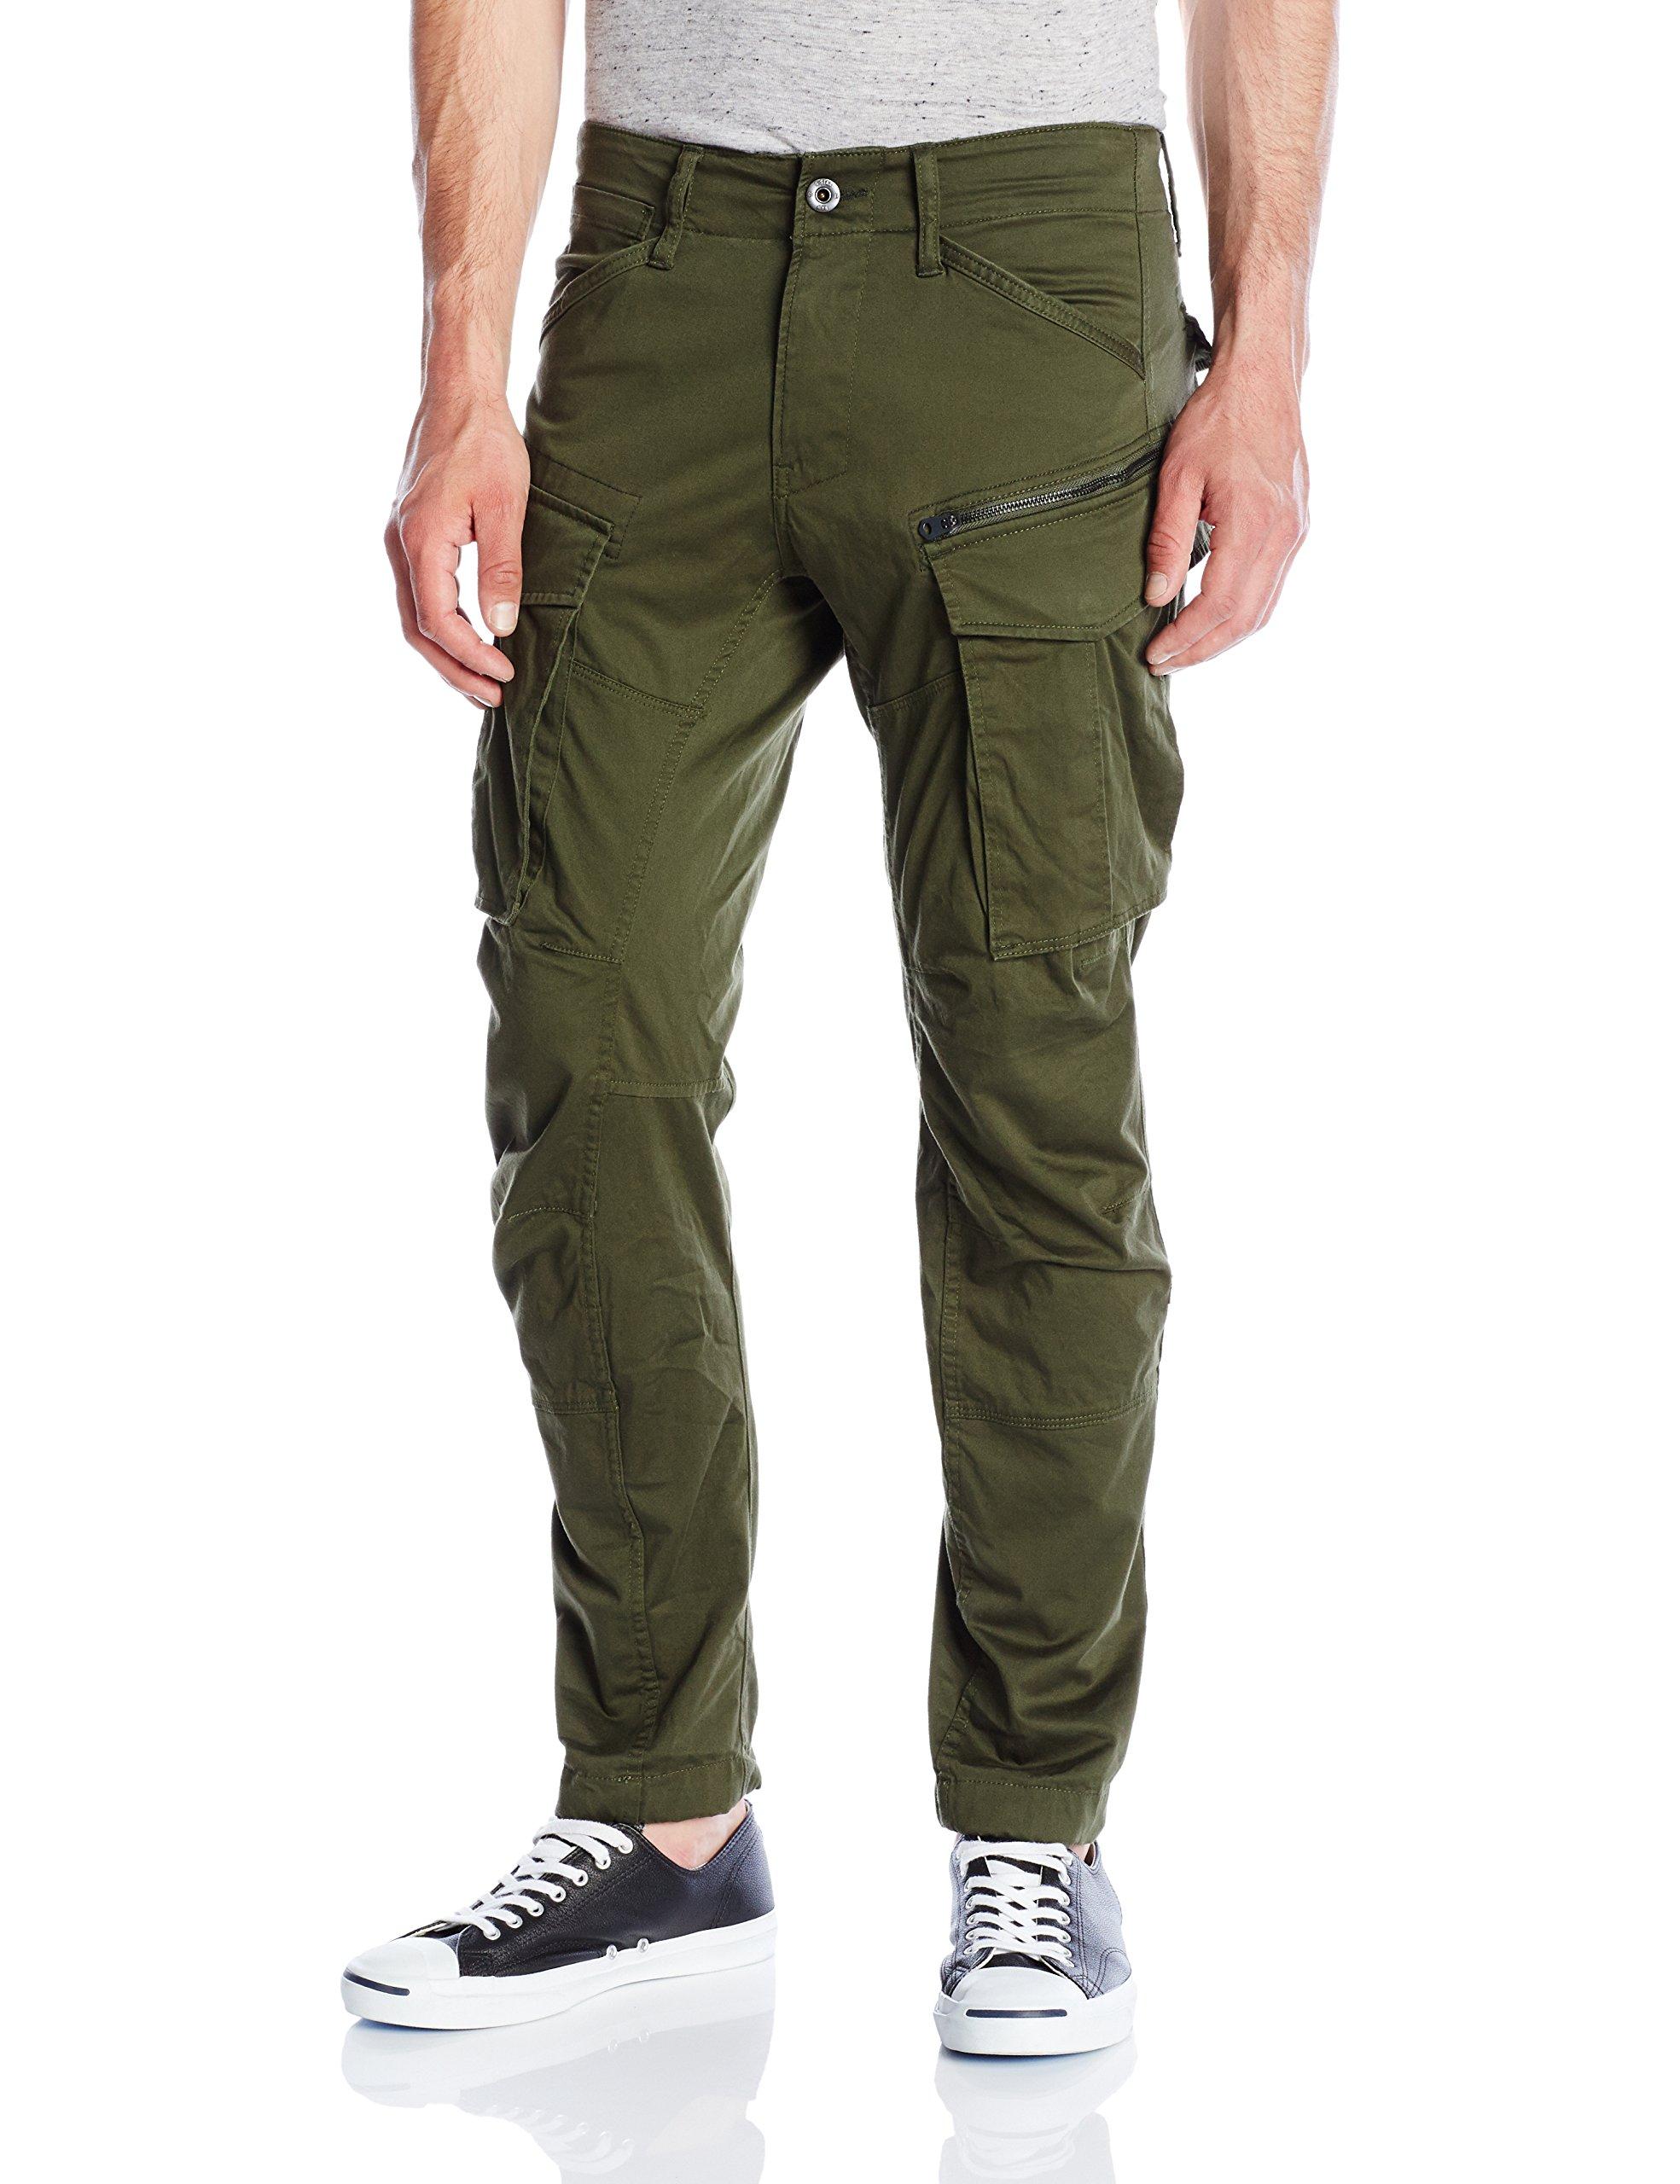 3d Tapered Green Raw star G Homme PantalonVertdk 605926w34l Straight Rovic 5126 Zip Bronze vN0mnPyw8O